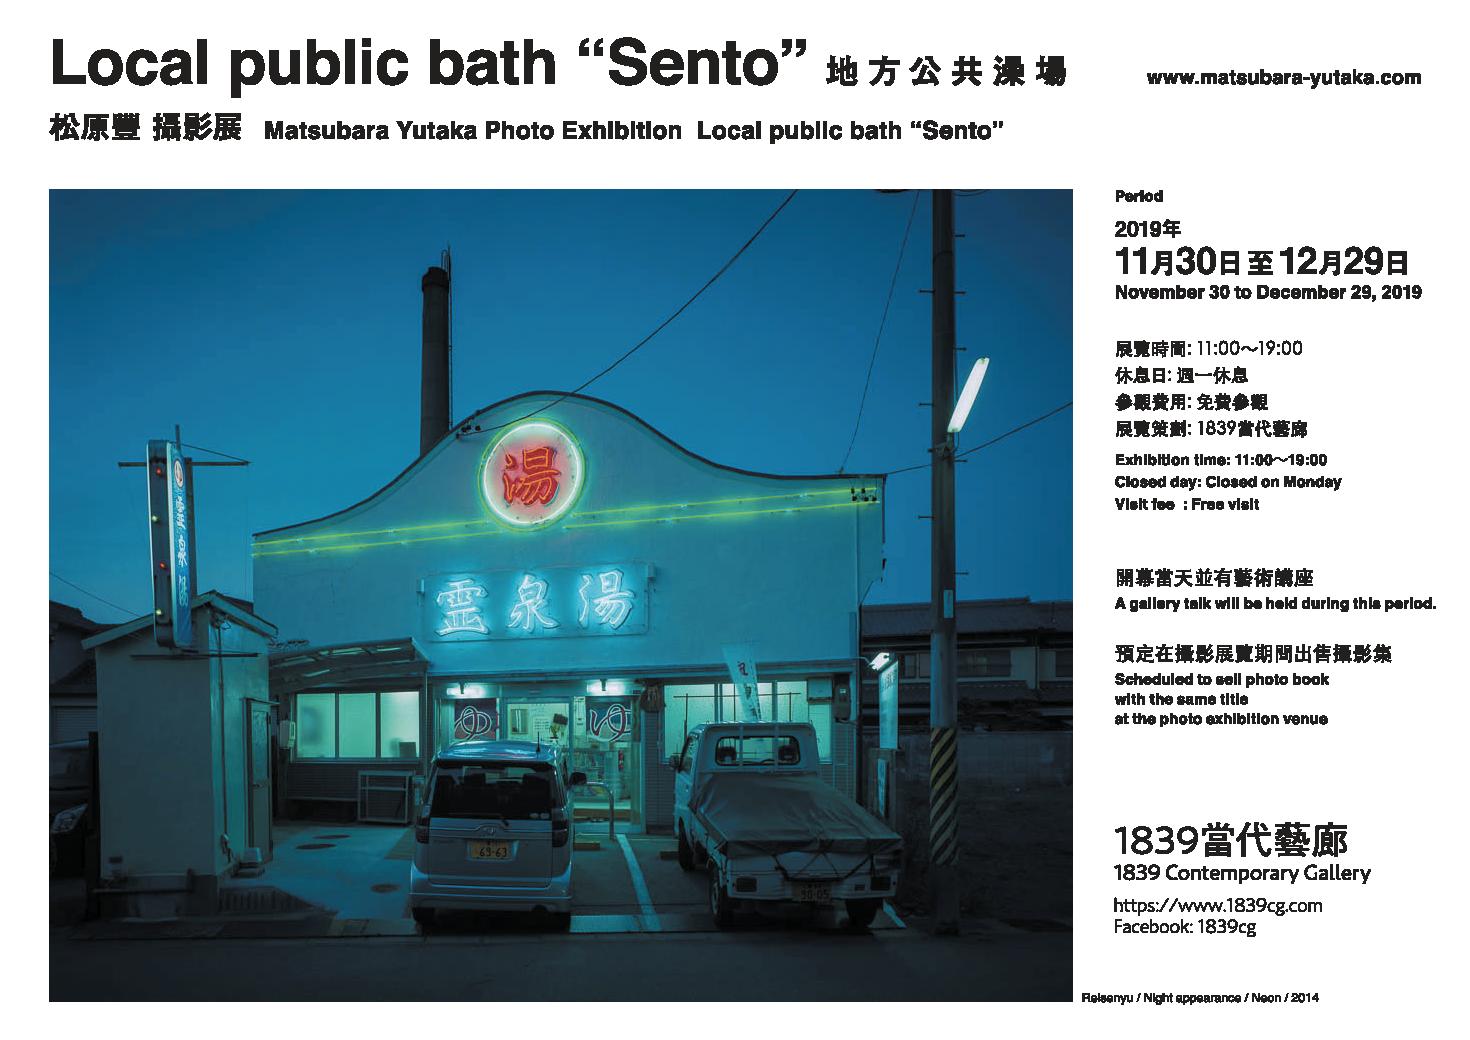 2019taipei local public bath sento exhibition